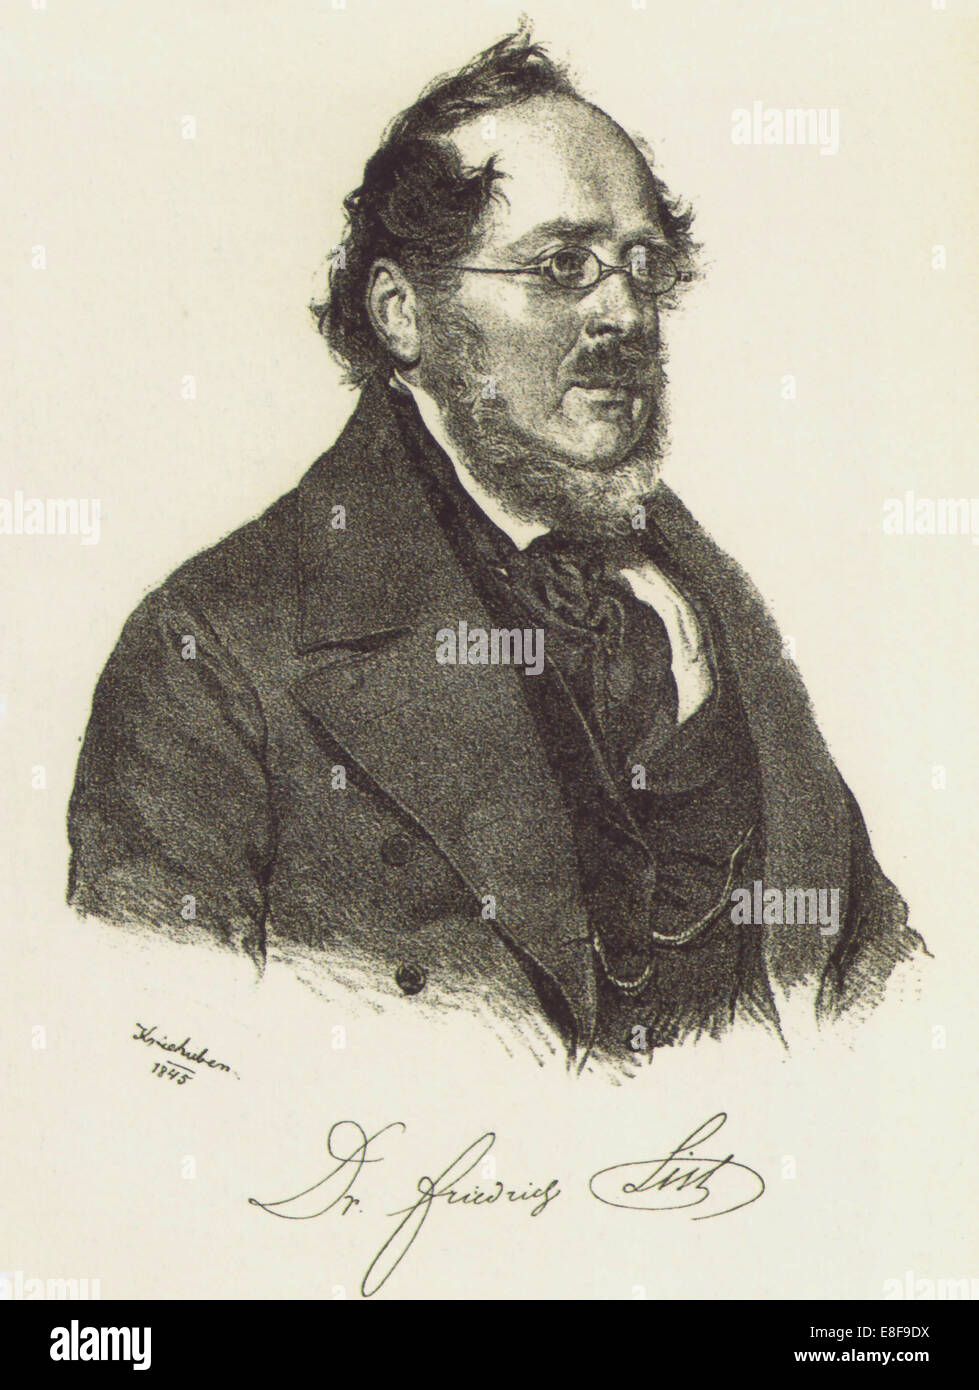 Elenco Friedrich (1789-1846). Artista: Kriehuber, Josef (1800-1876) Immagini Stock